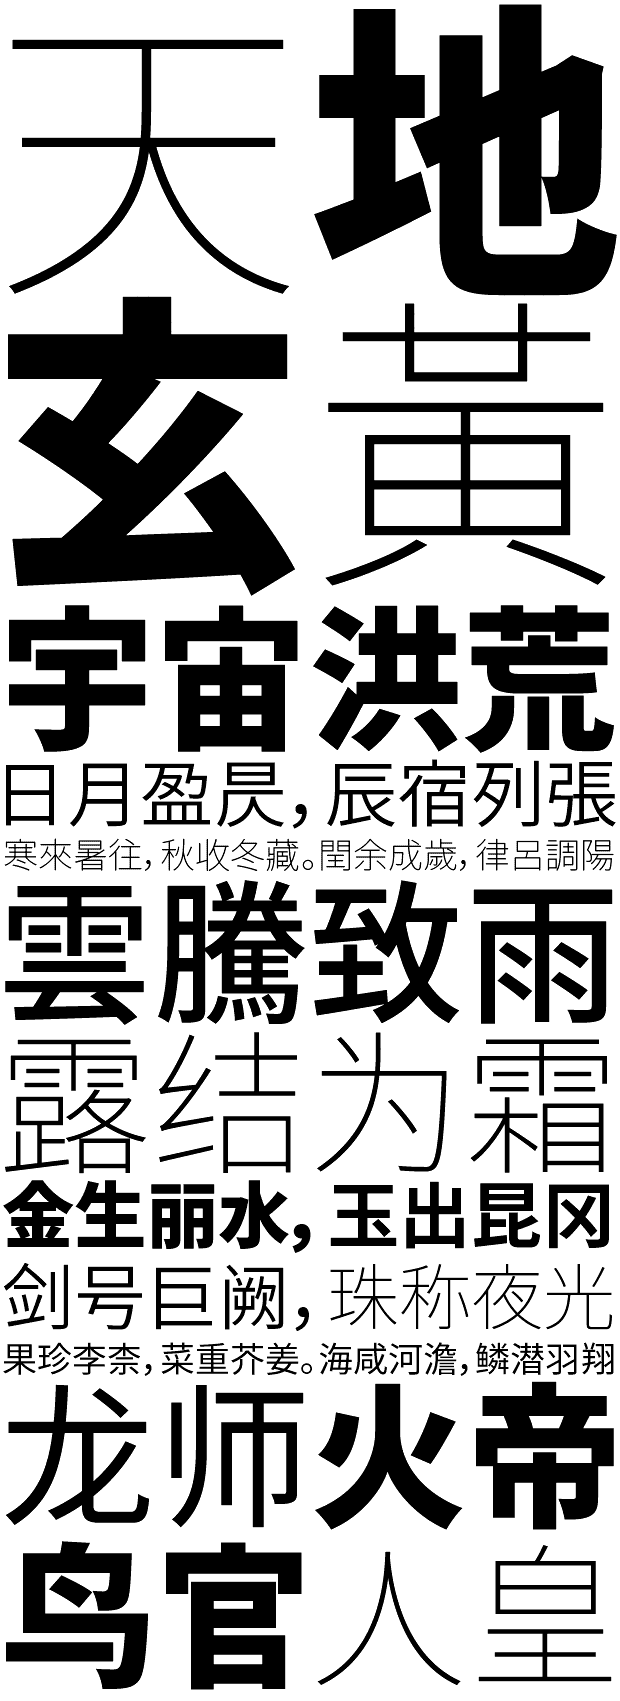 siyuanheiti-1.png